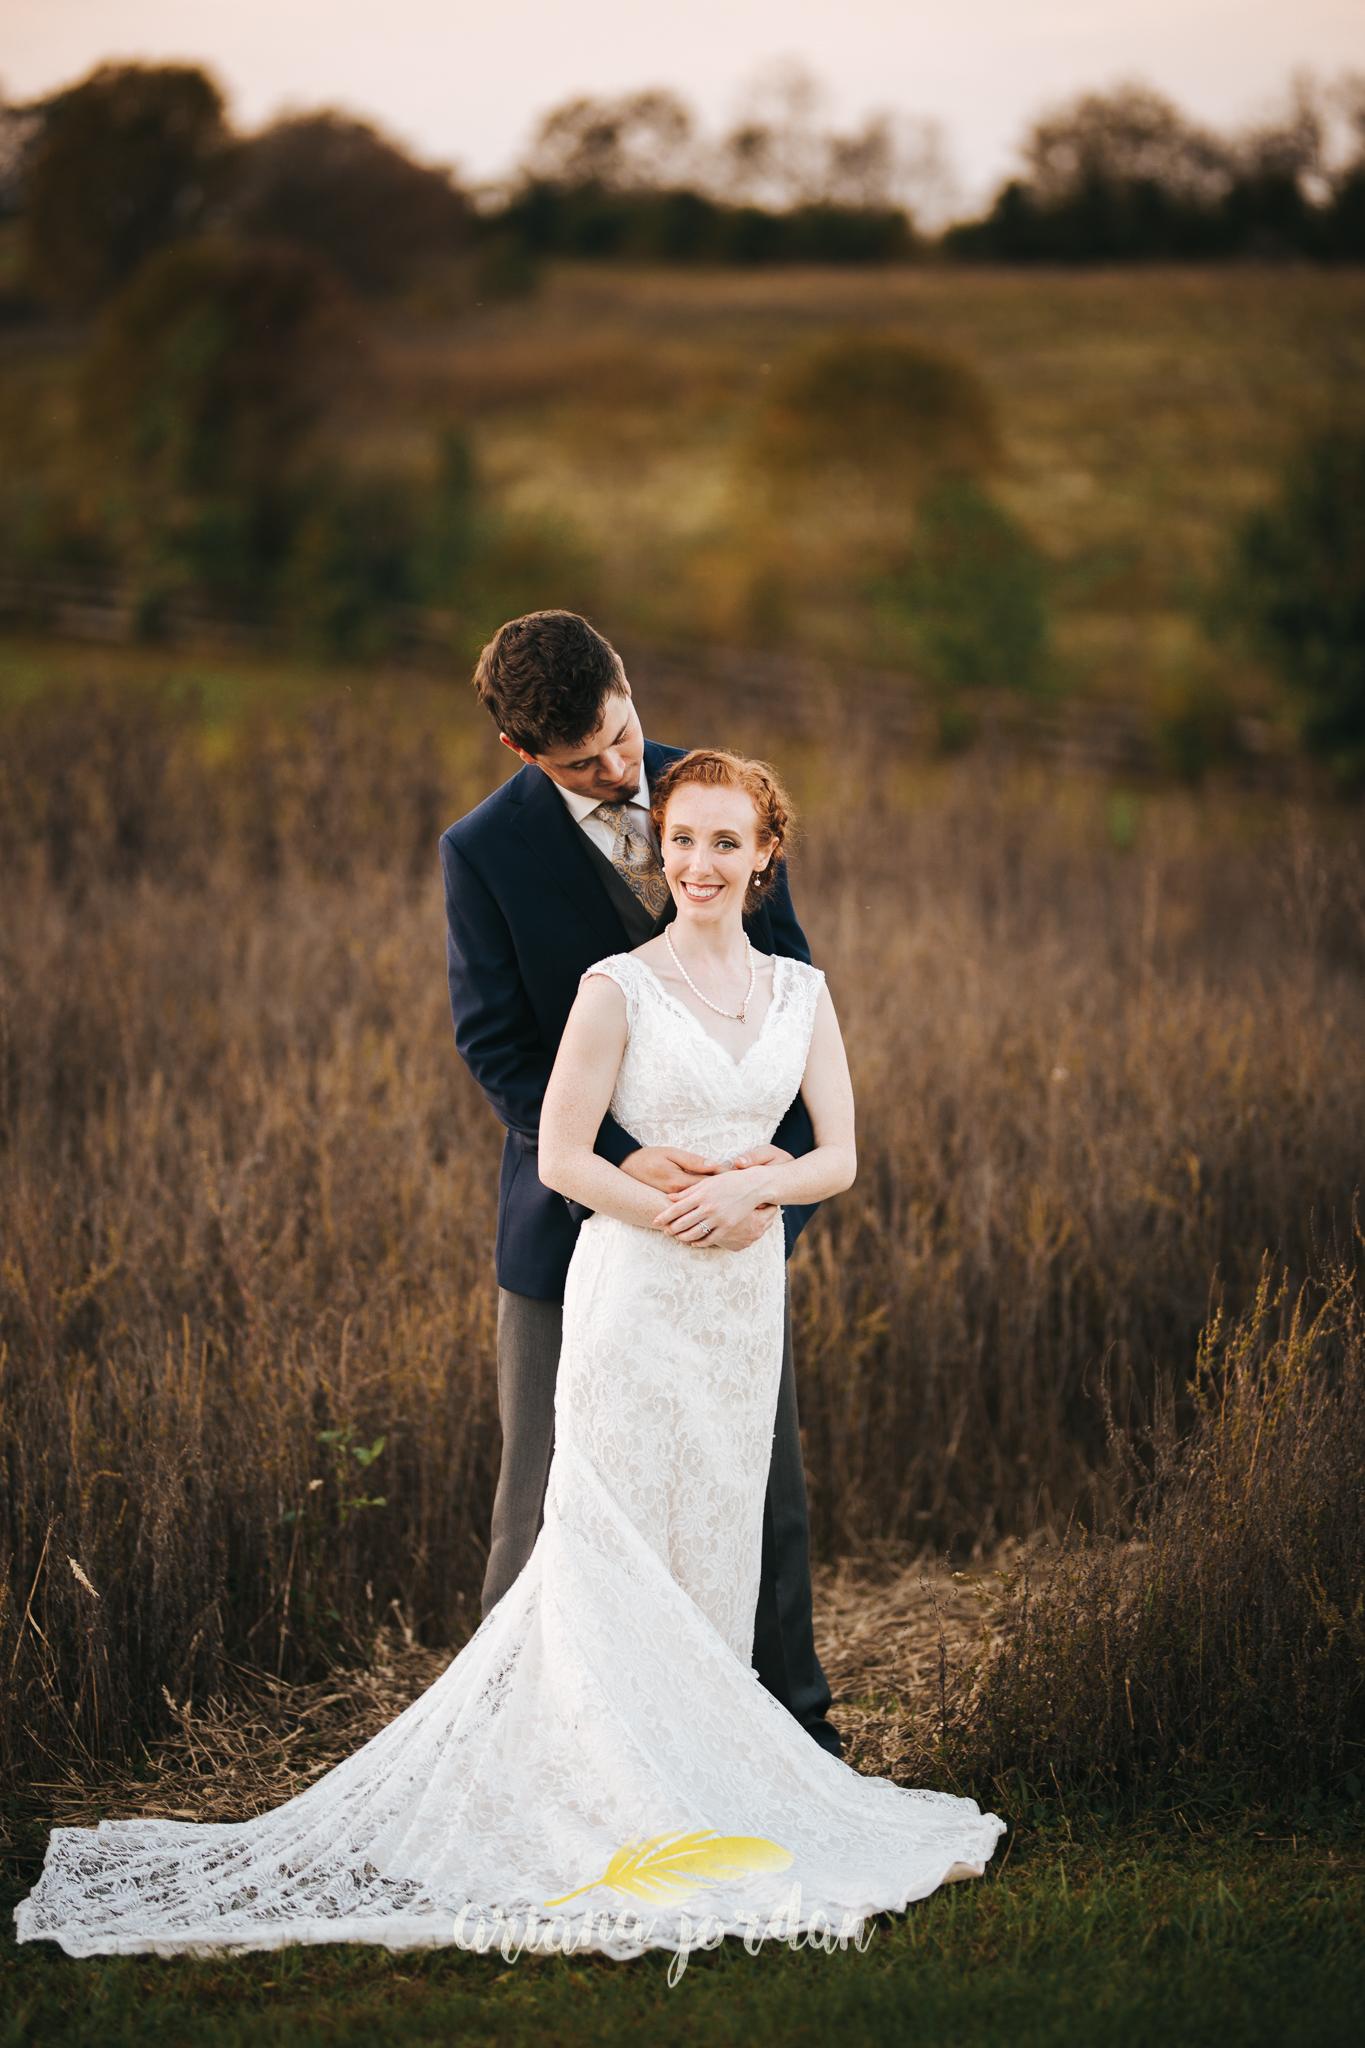 135 Ariana Jordan Photography -Moonlight Fields Lexington Ky Wedding Photographer 5133.jpg